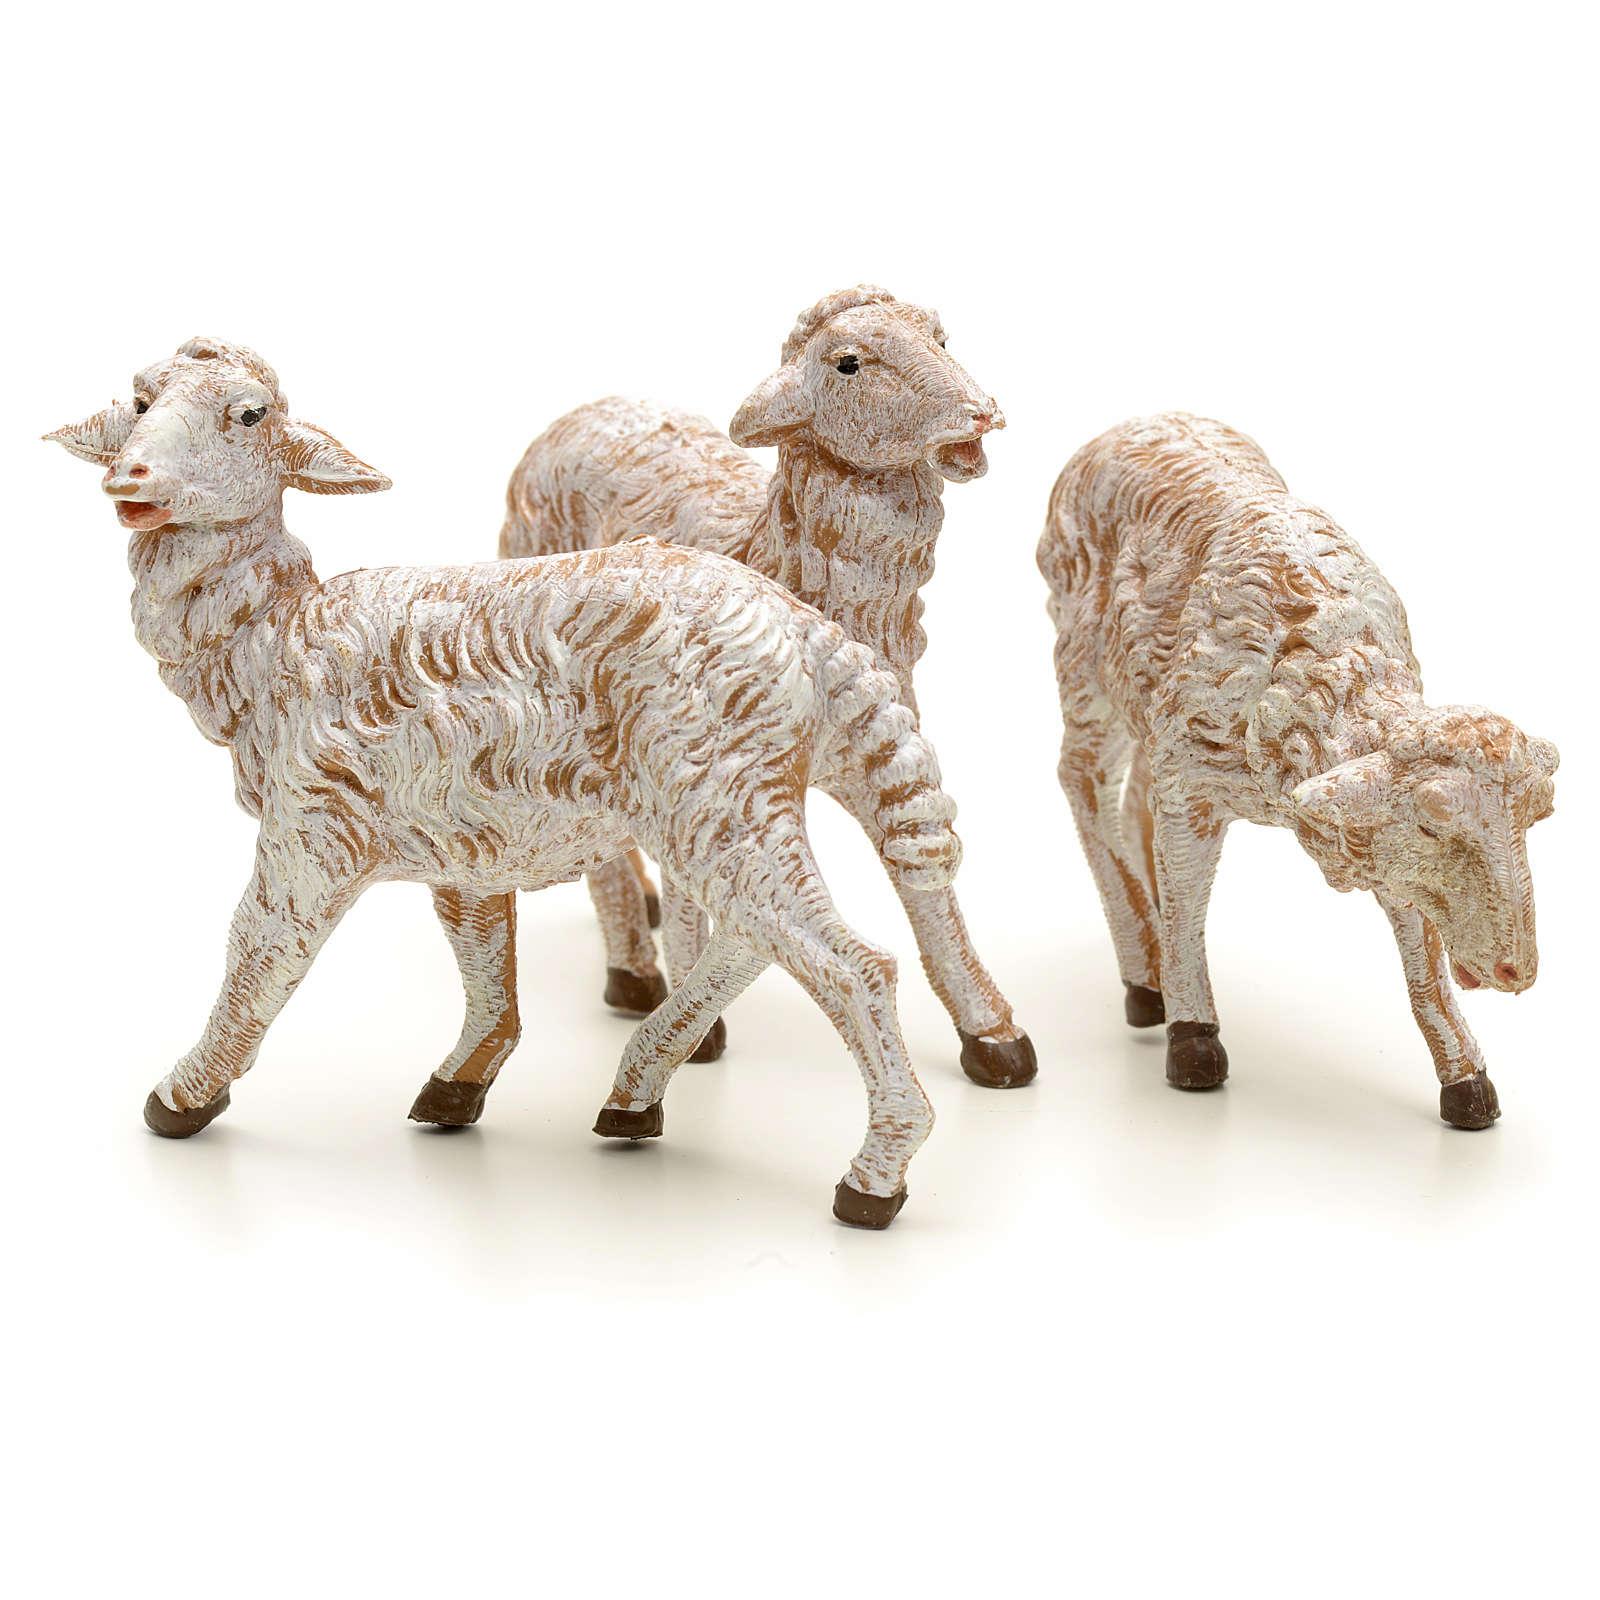 Moutons crèche Fontanini 19 cm 3 pcs 4